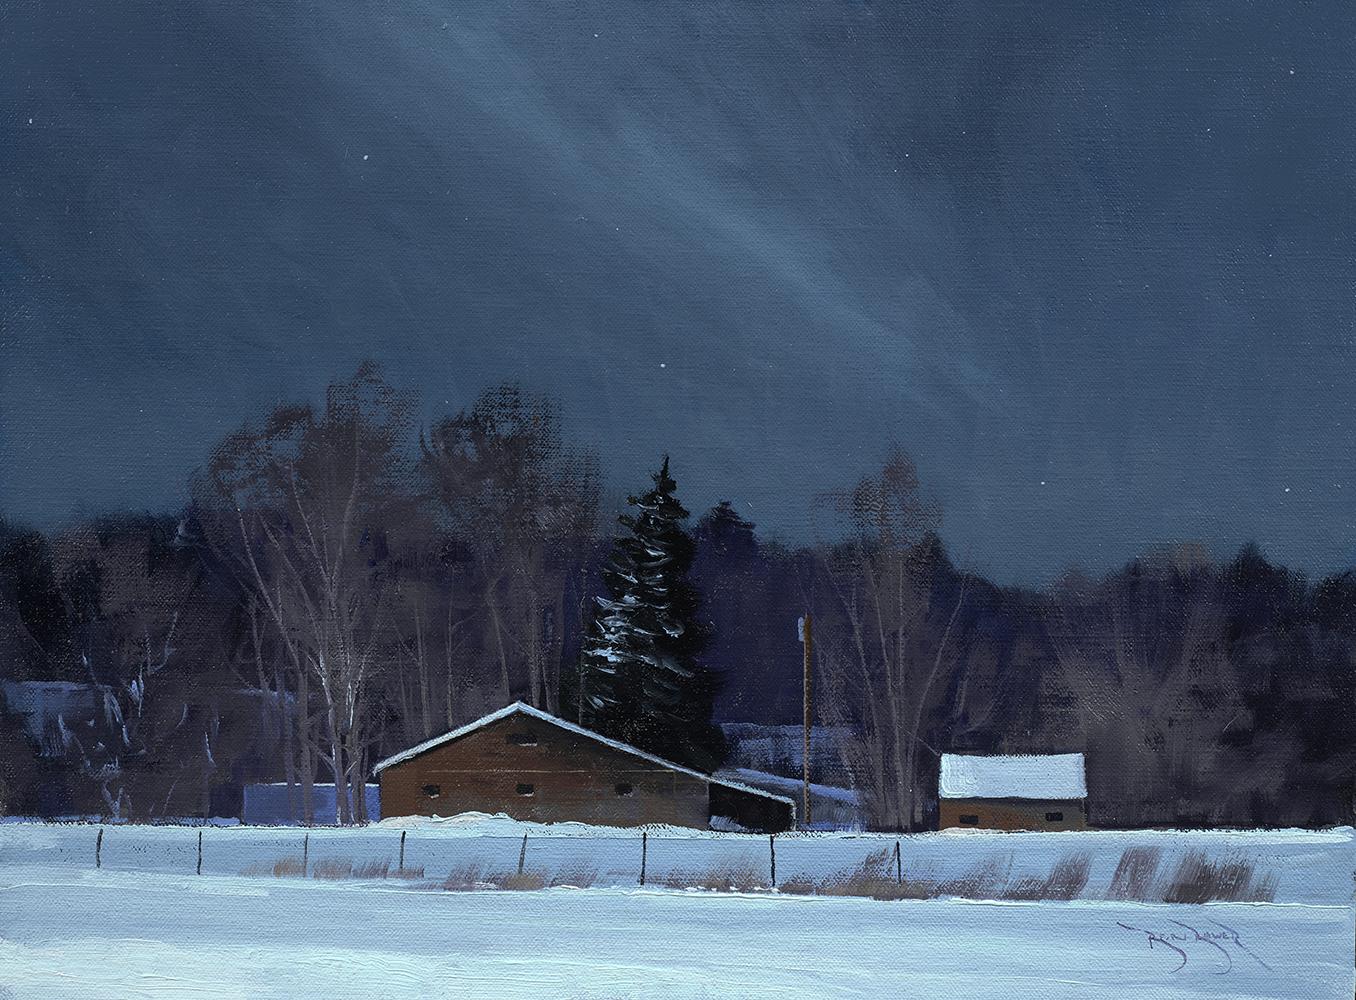 ben_bauer_bb1101_grant_barns_at_night.jpg